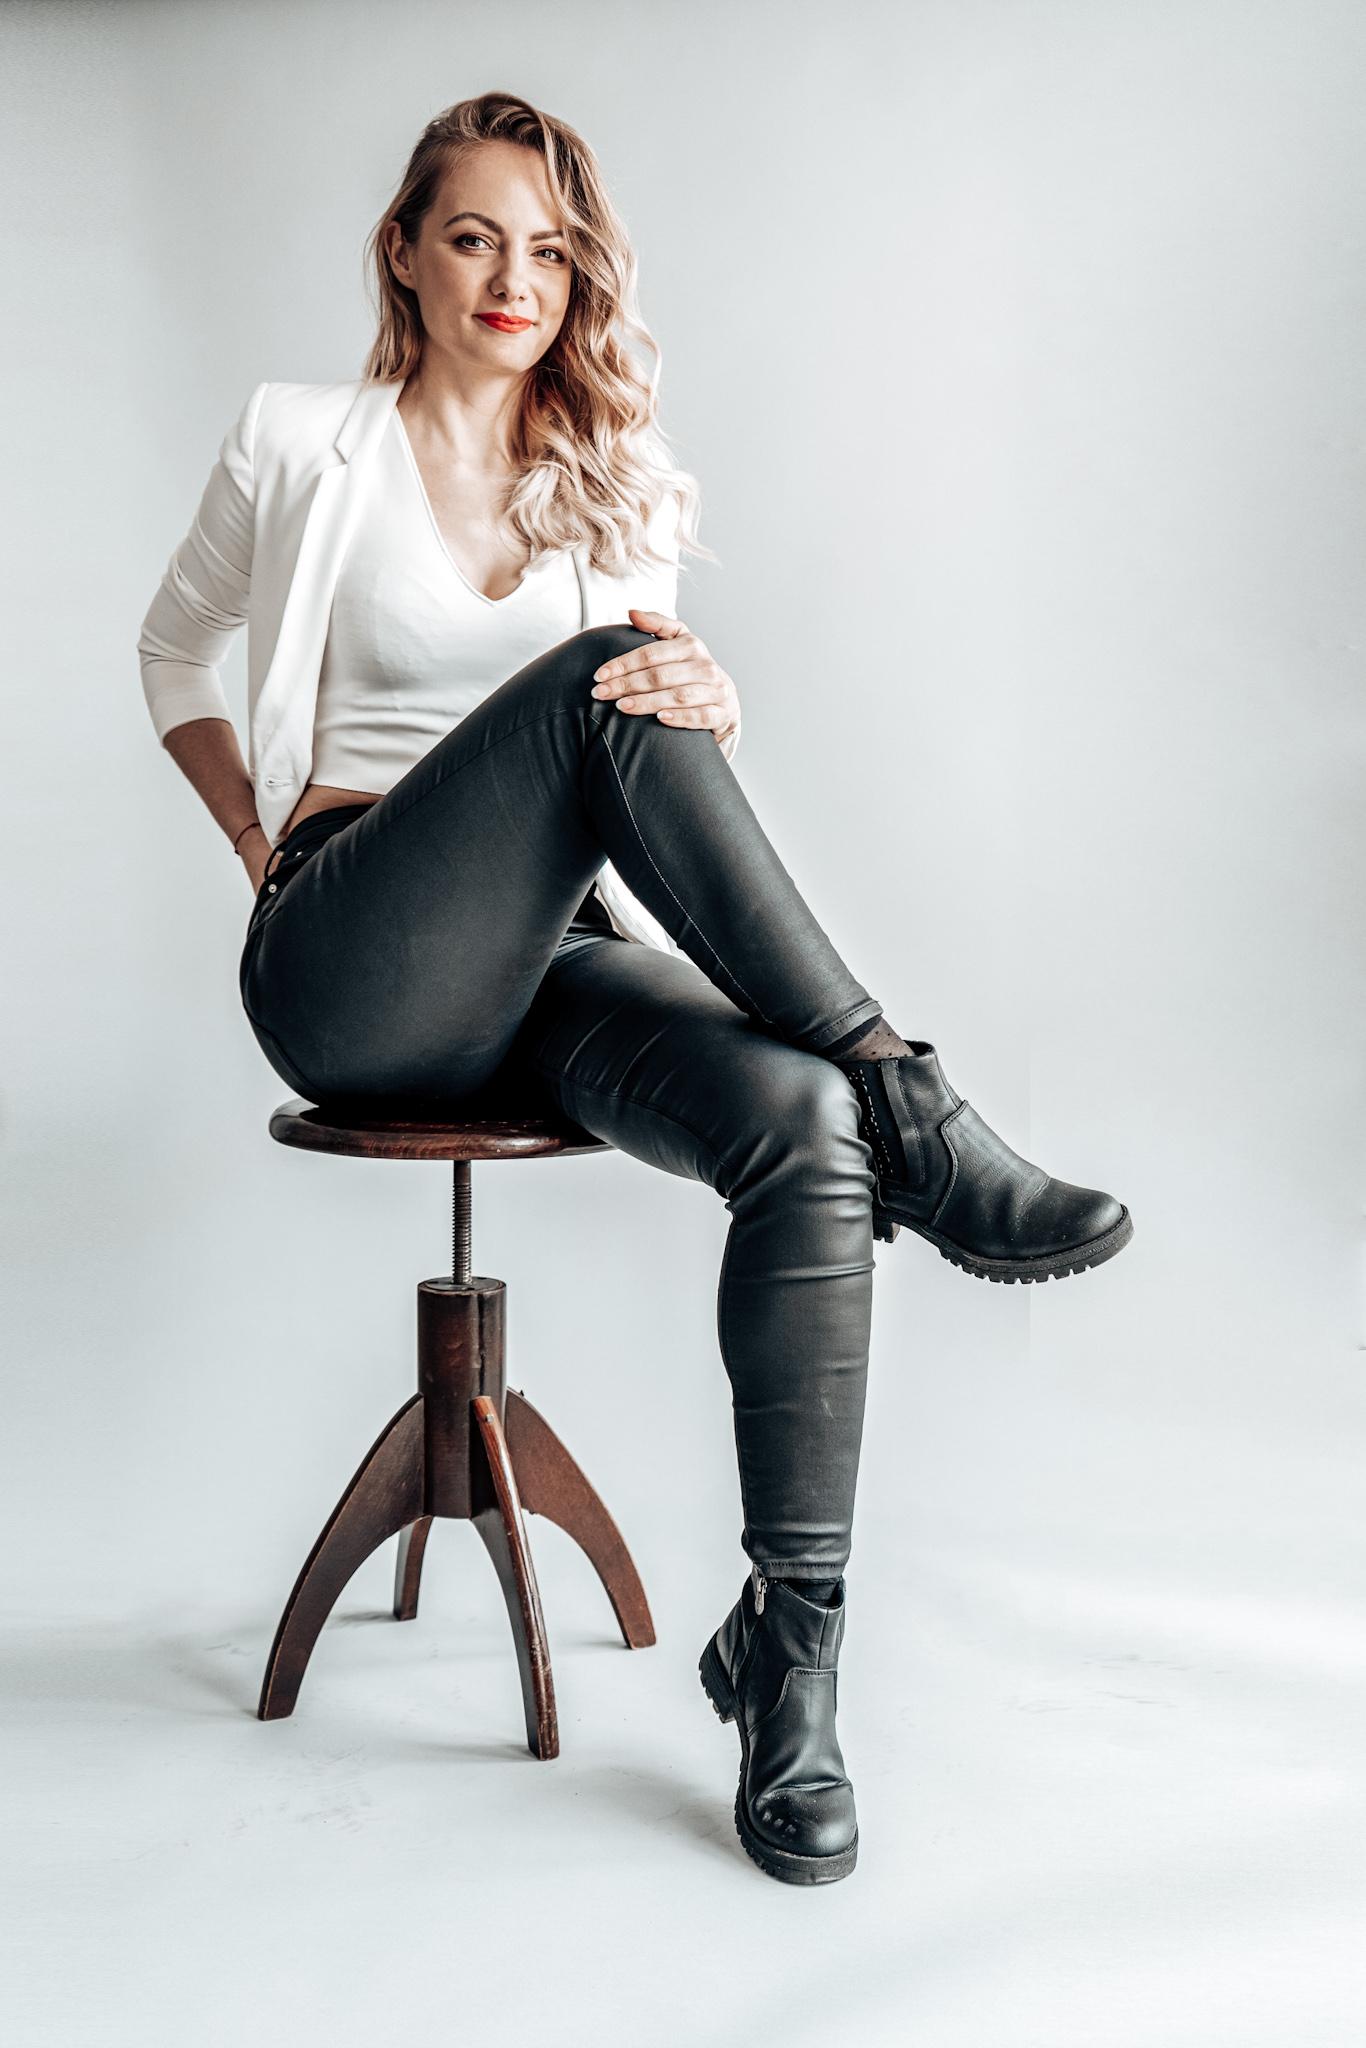 Erika Csuportova